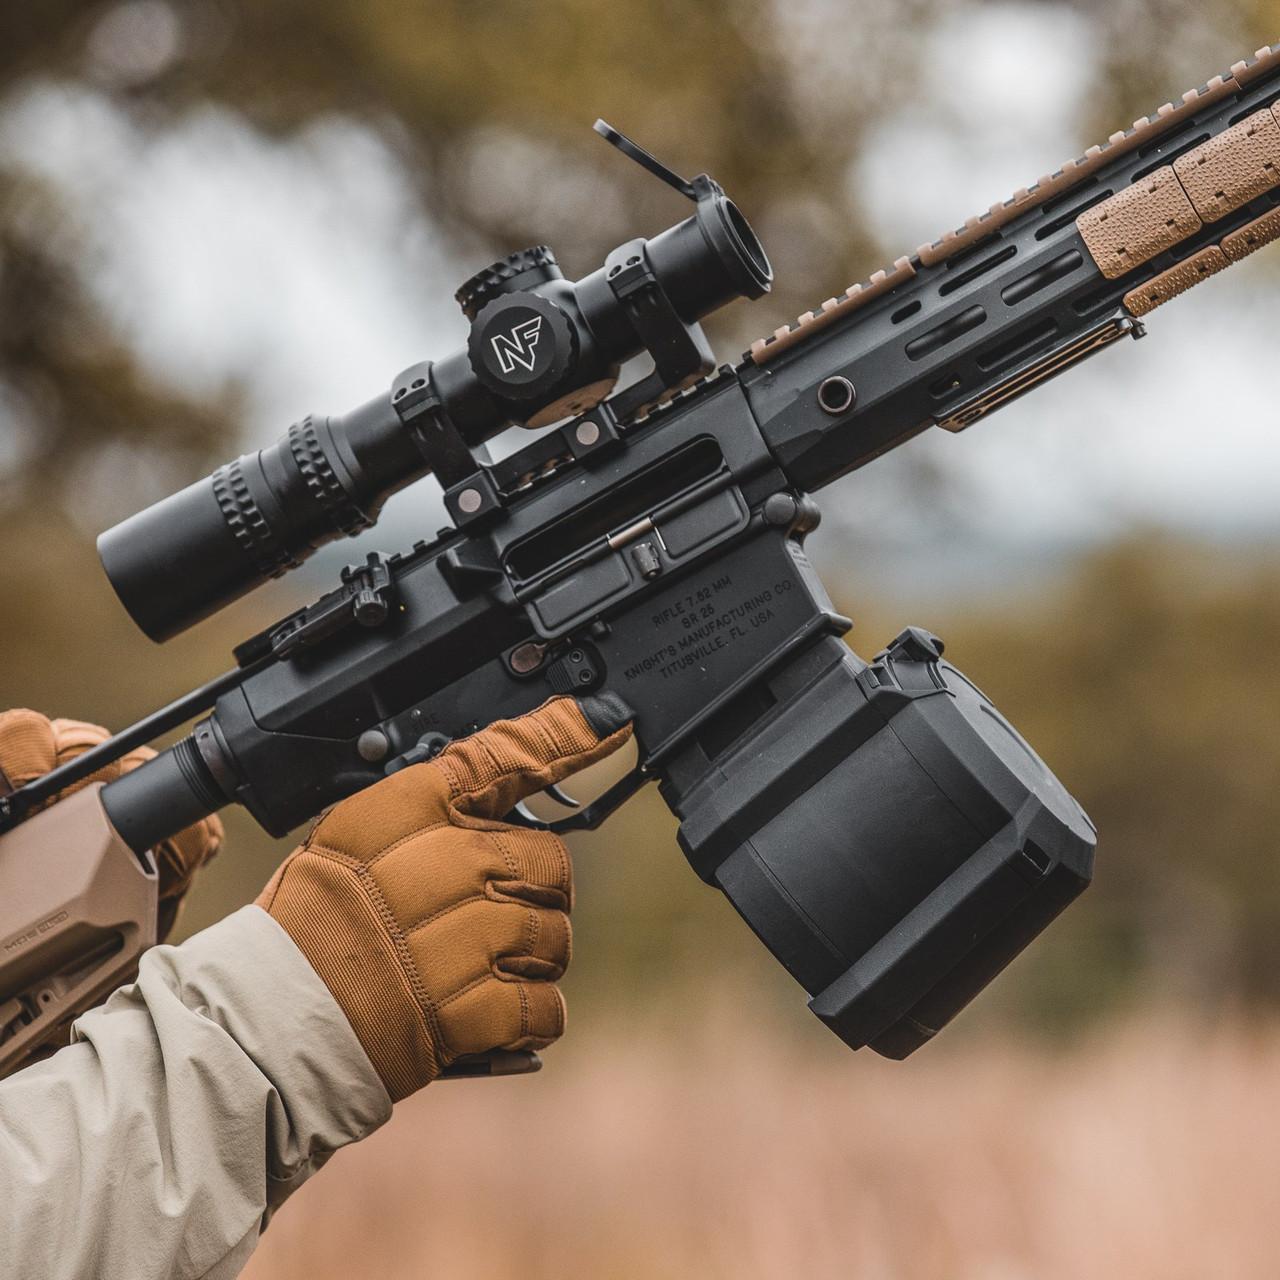 Magpul PMAG D-50 LR/SR GEN M3 50/5 7.62 NATO Magazine